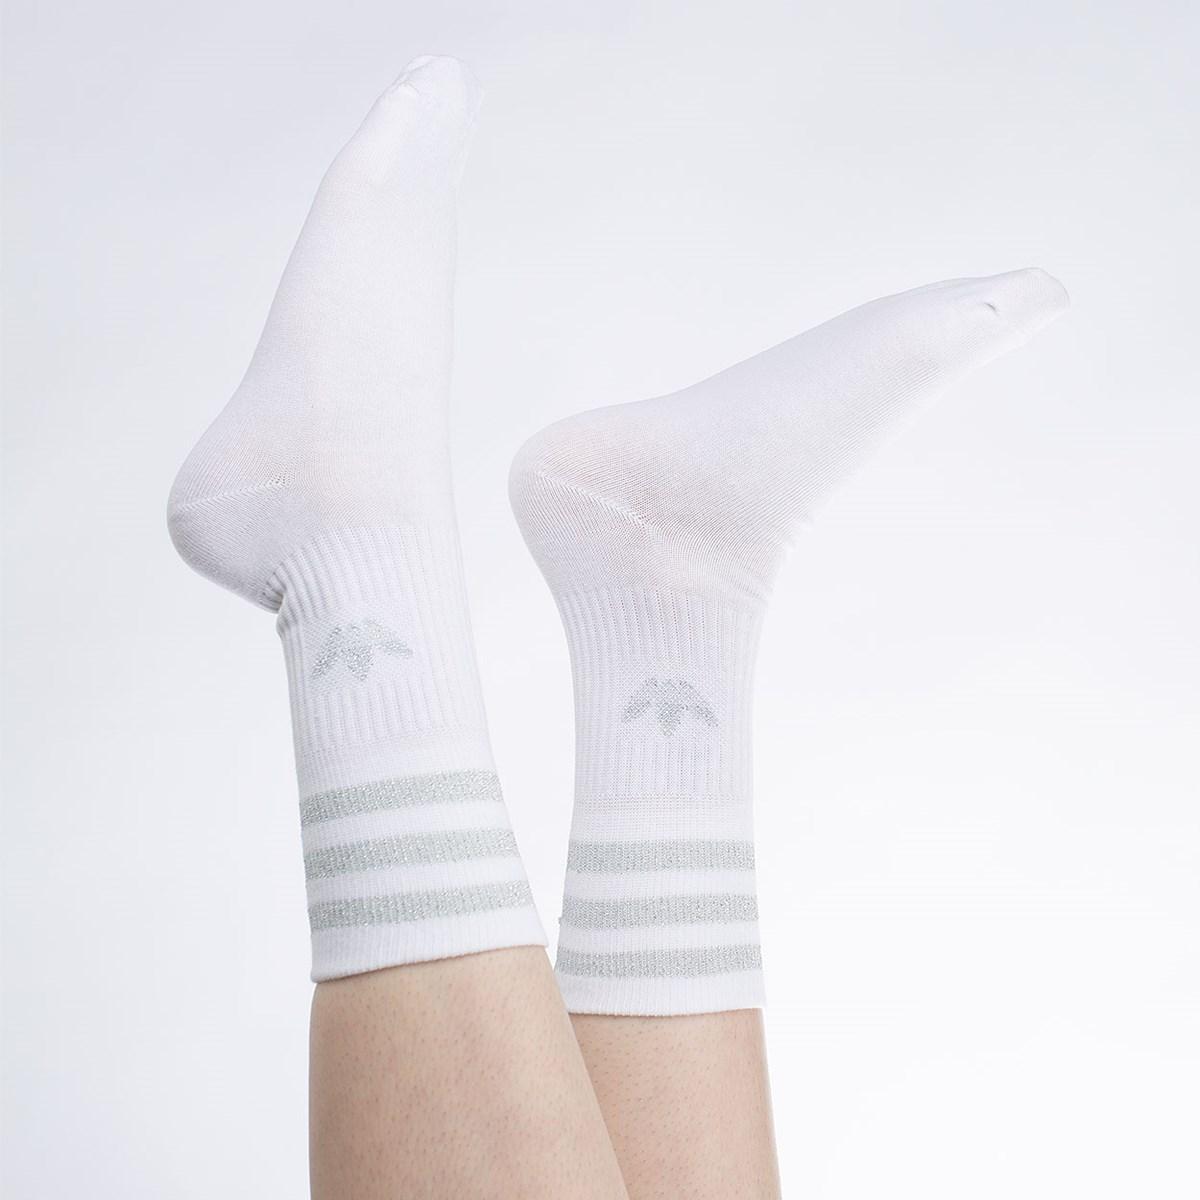 Meia adidas Mid Cut Glitter Kit 2 Pares White GN3069